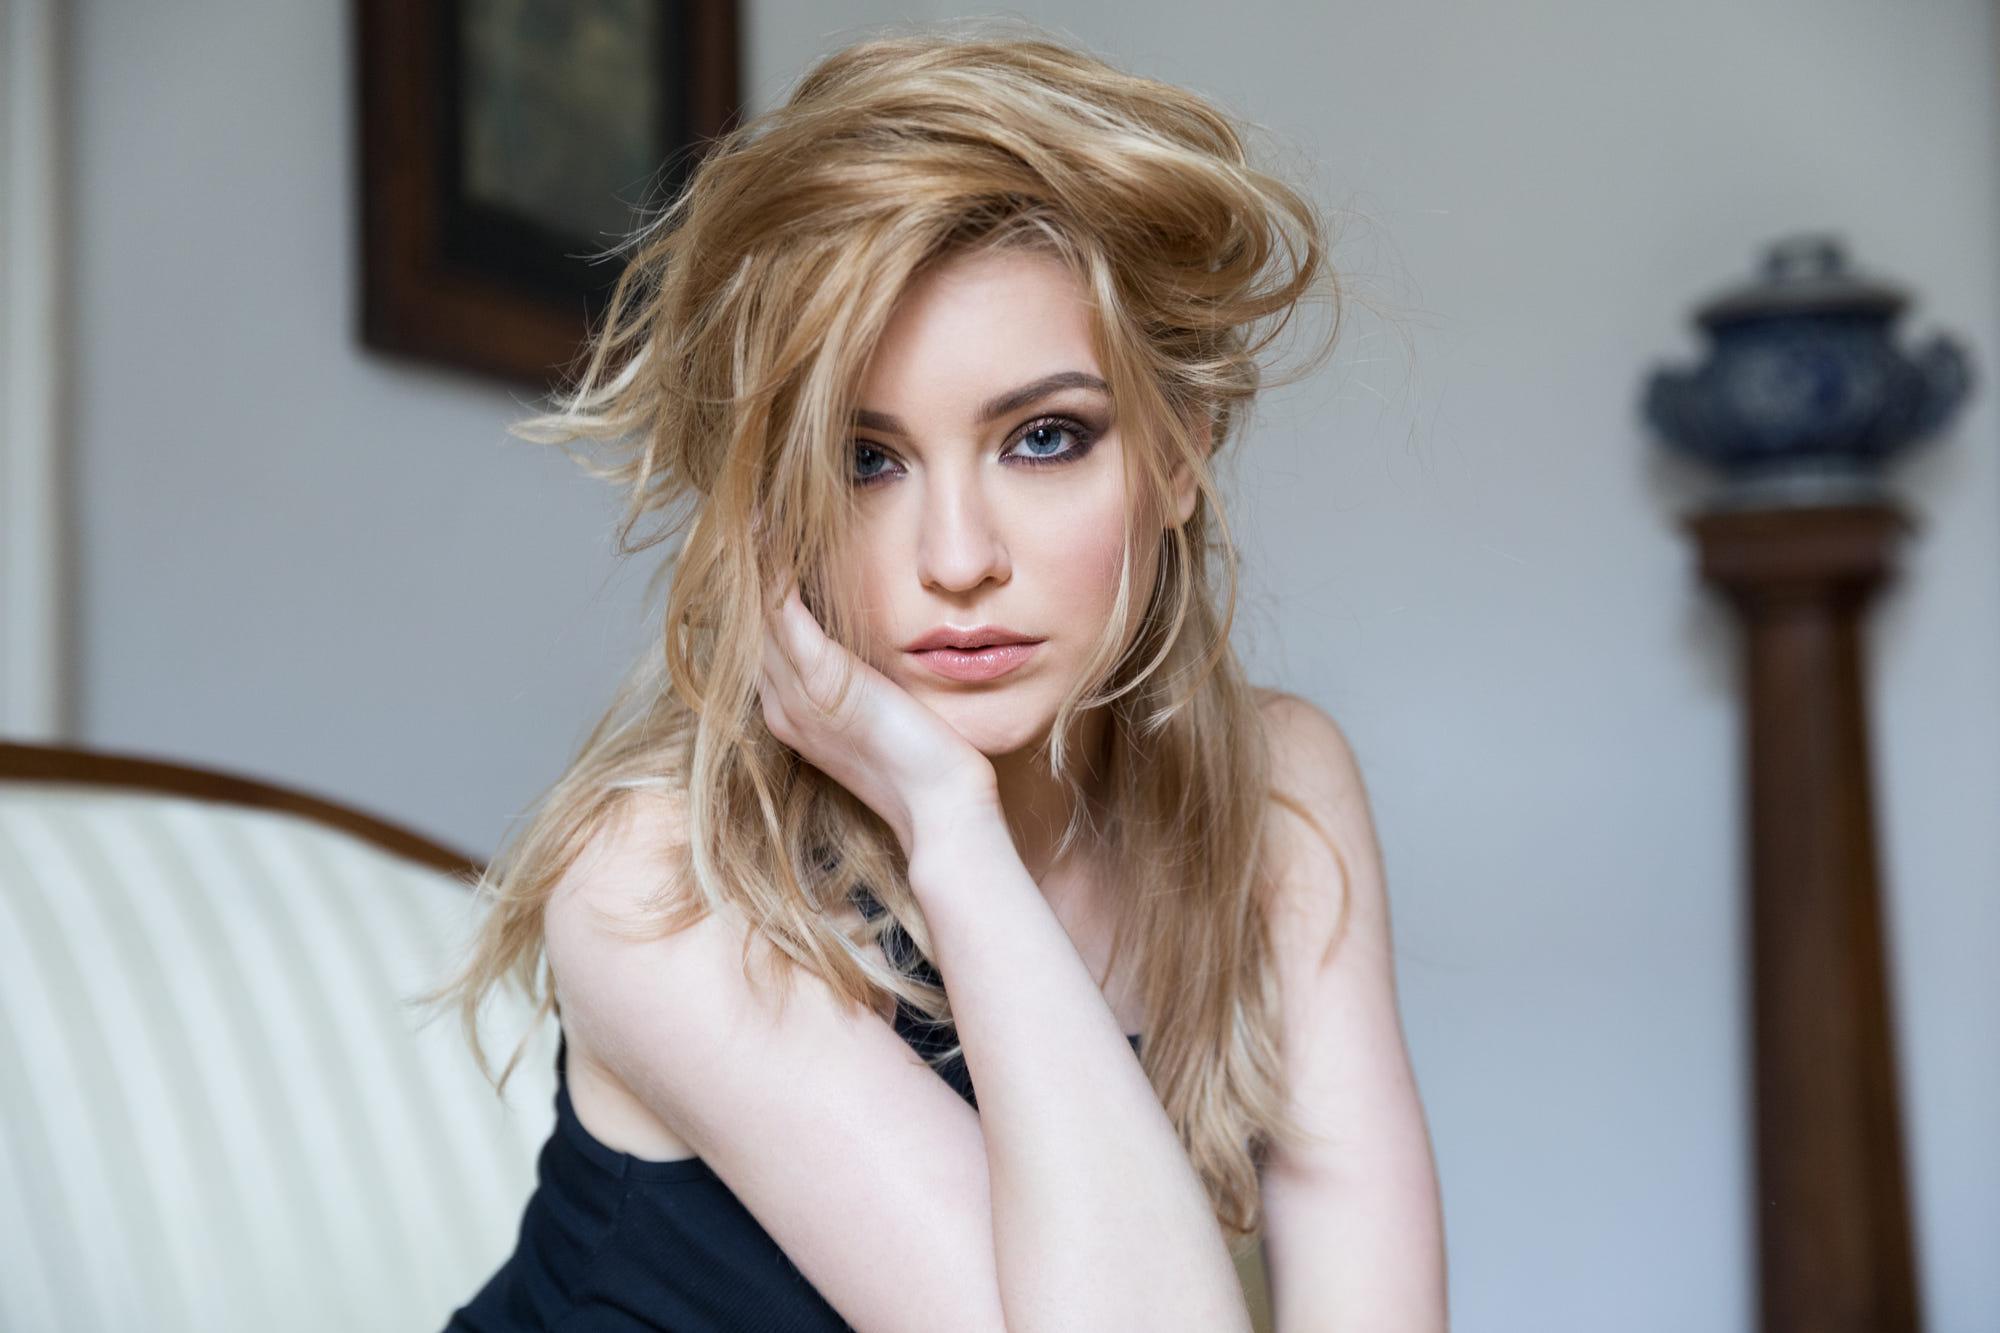 People 2000x1333 women blonde face blue eyes eyeshadow portrait Aura Dosoftei Bogdan Moldovan